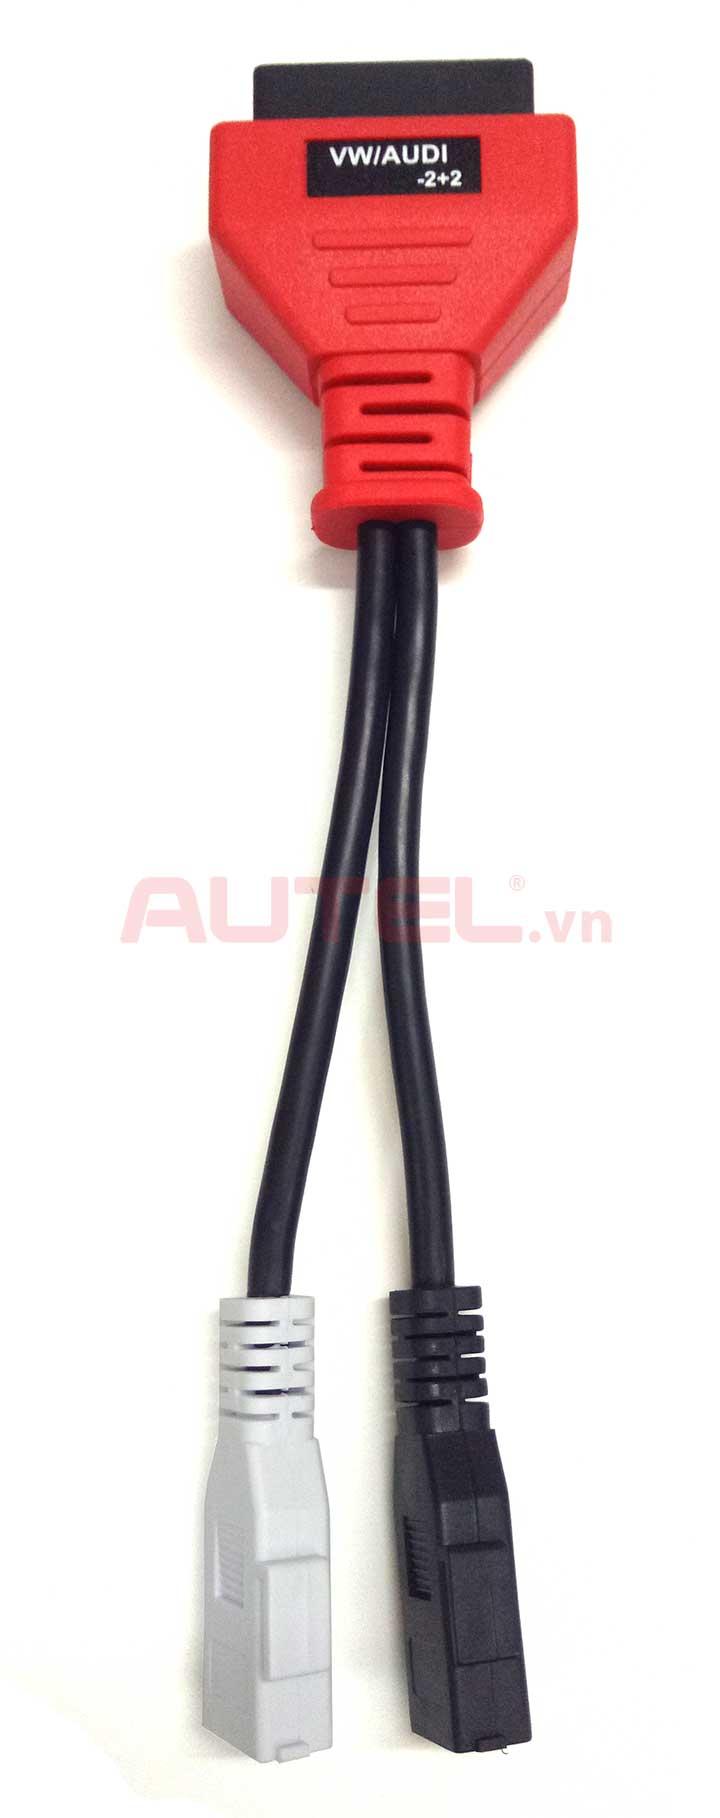 Cable VW/Audi -2+2